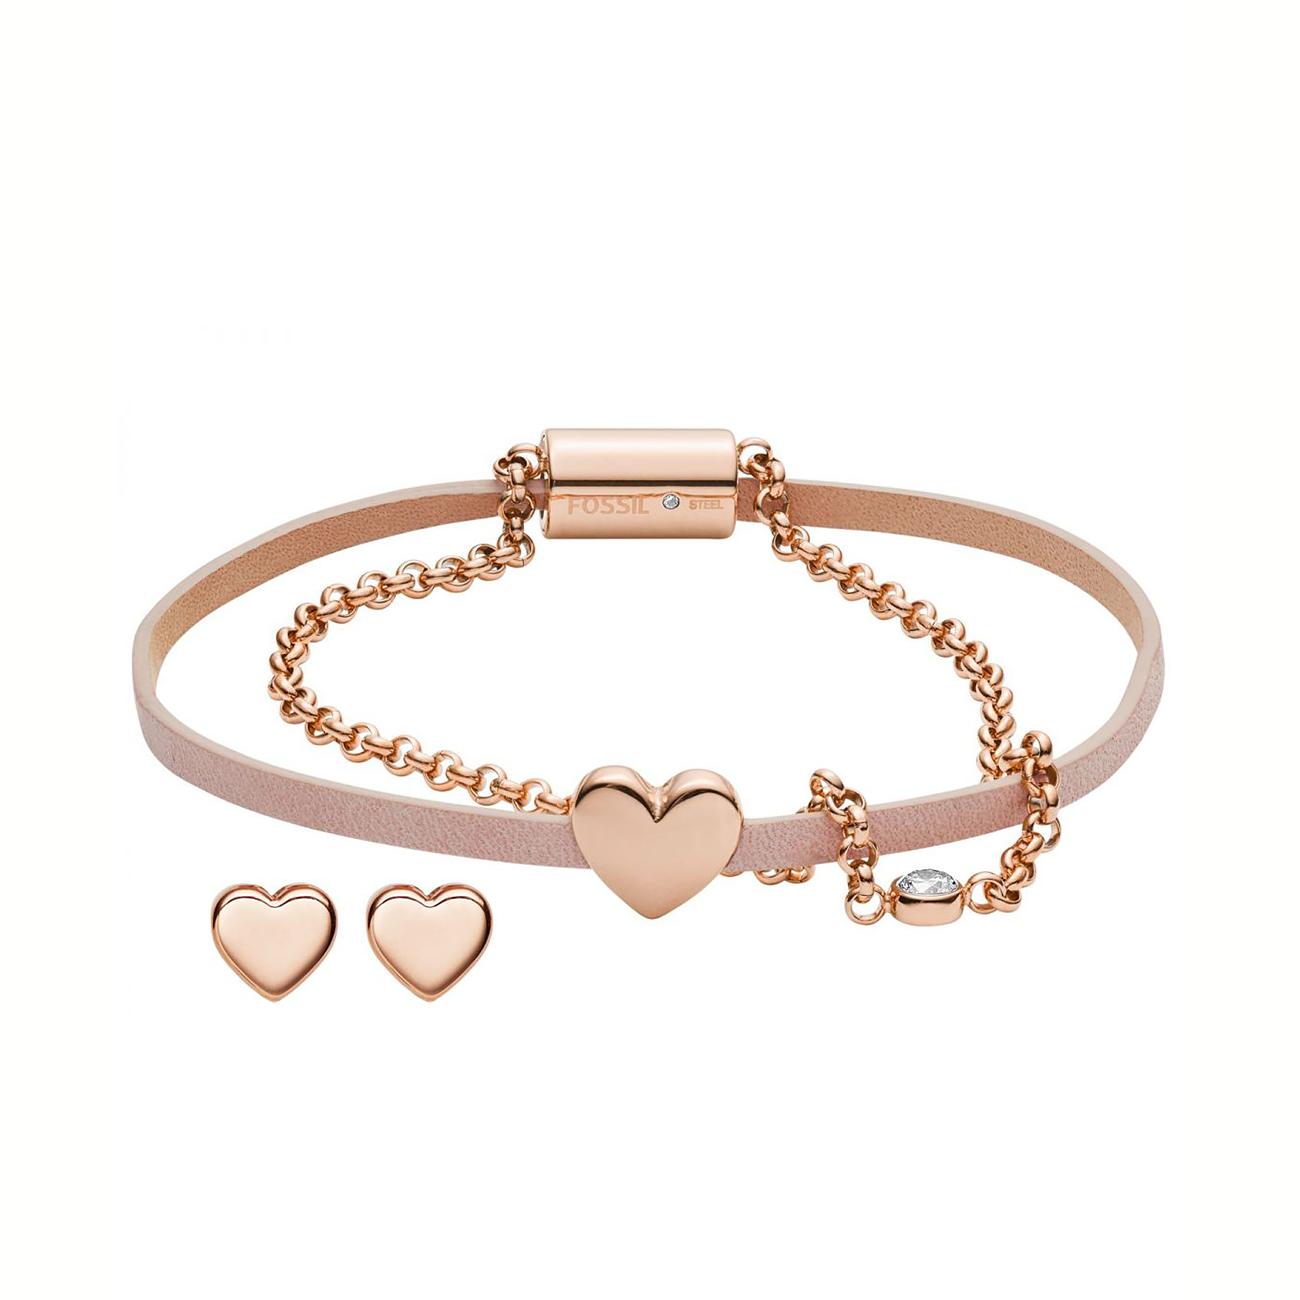 JF03051791 Gift Set Ladies' Bracelet and Stud Earrings Heart imagine produs